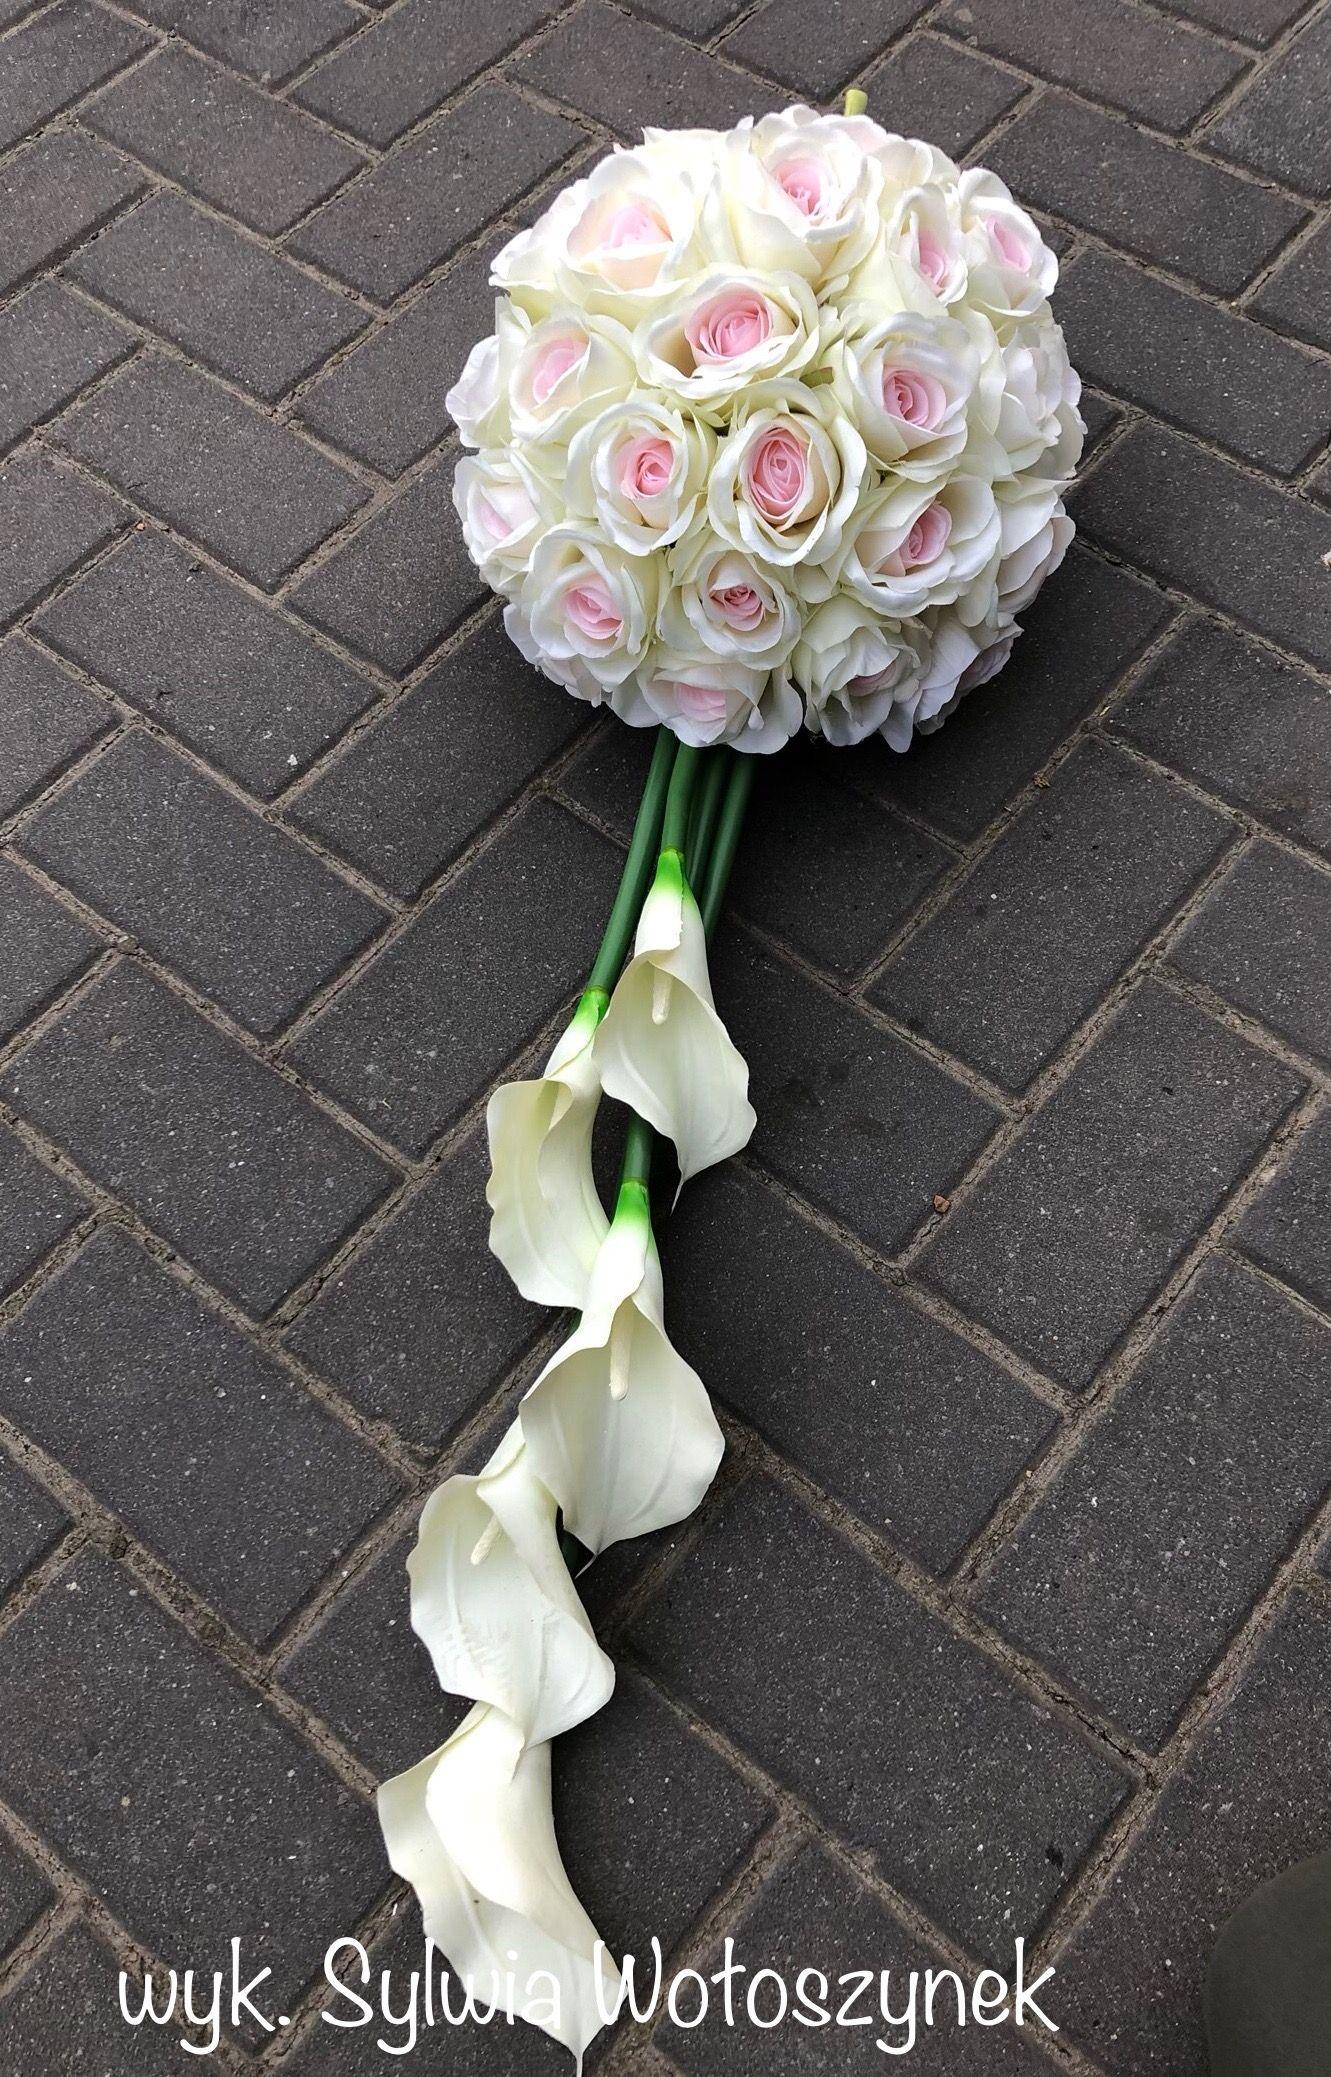 Pin By Miroslawa Starzynska On Powitania Rose Flower Wallpaper Flower Pictures Valentines Flowers